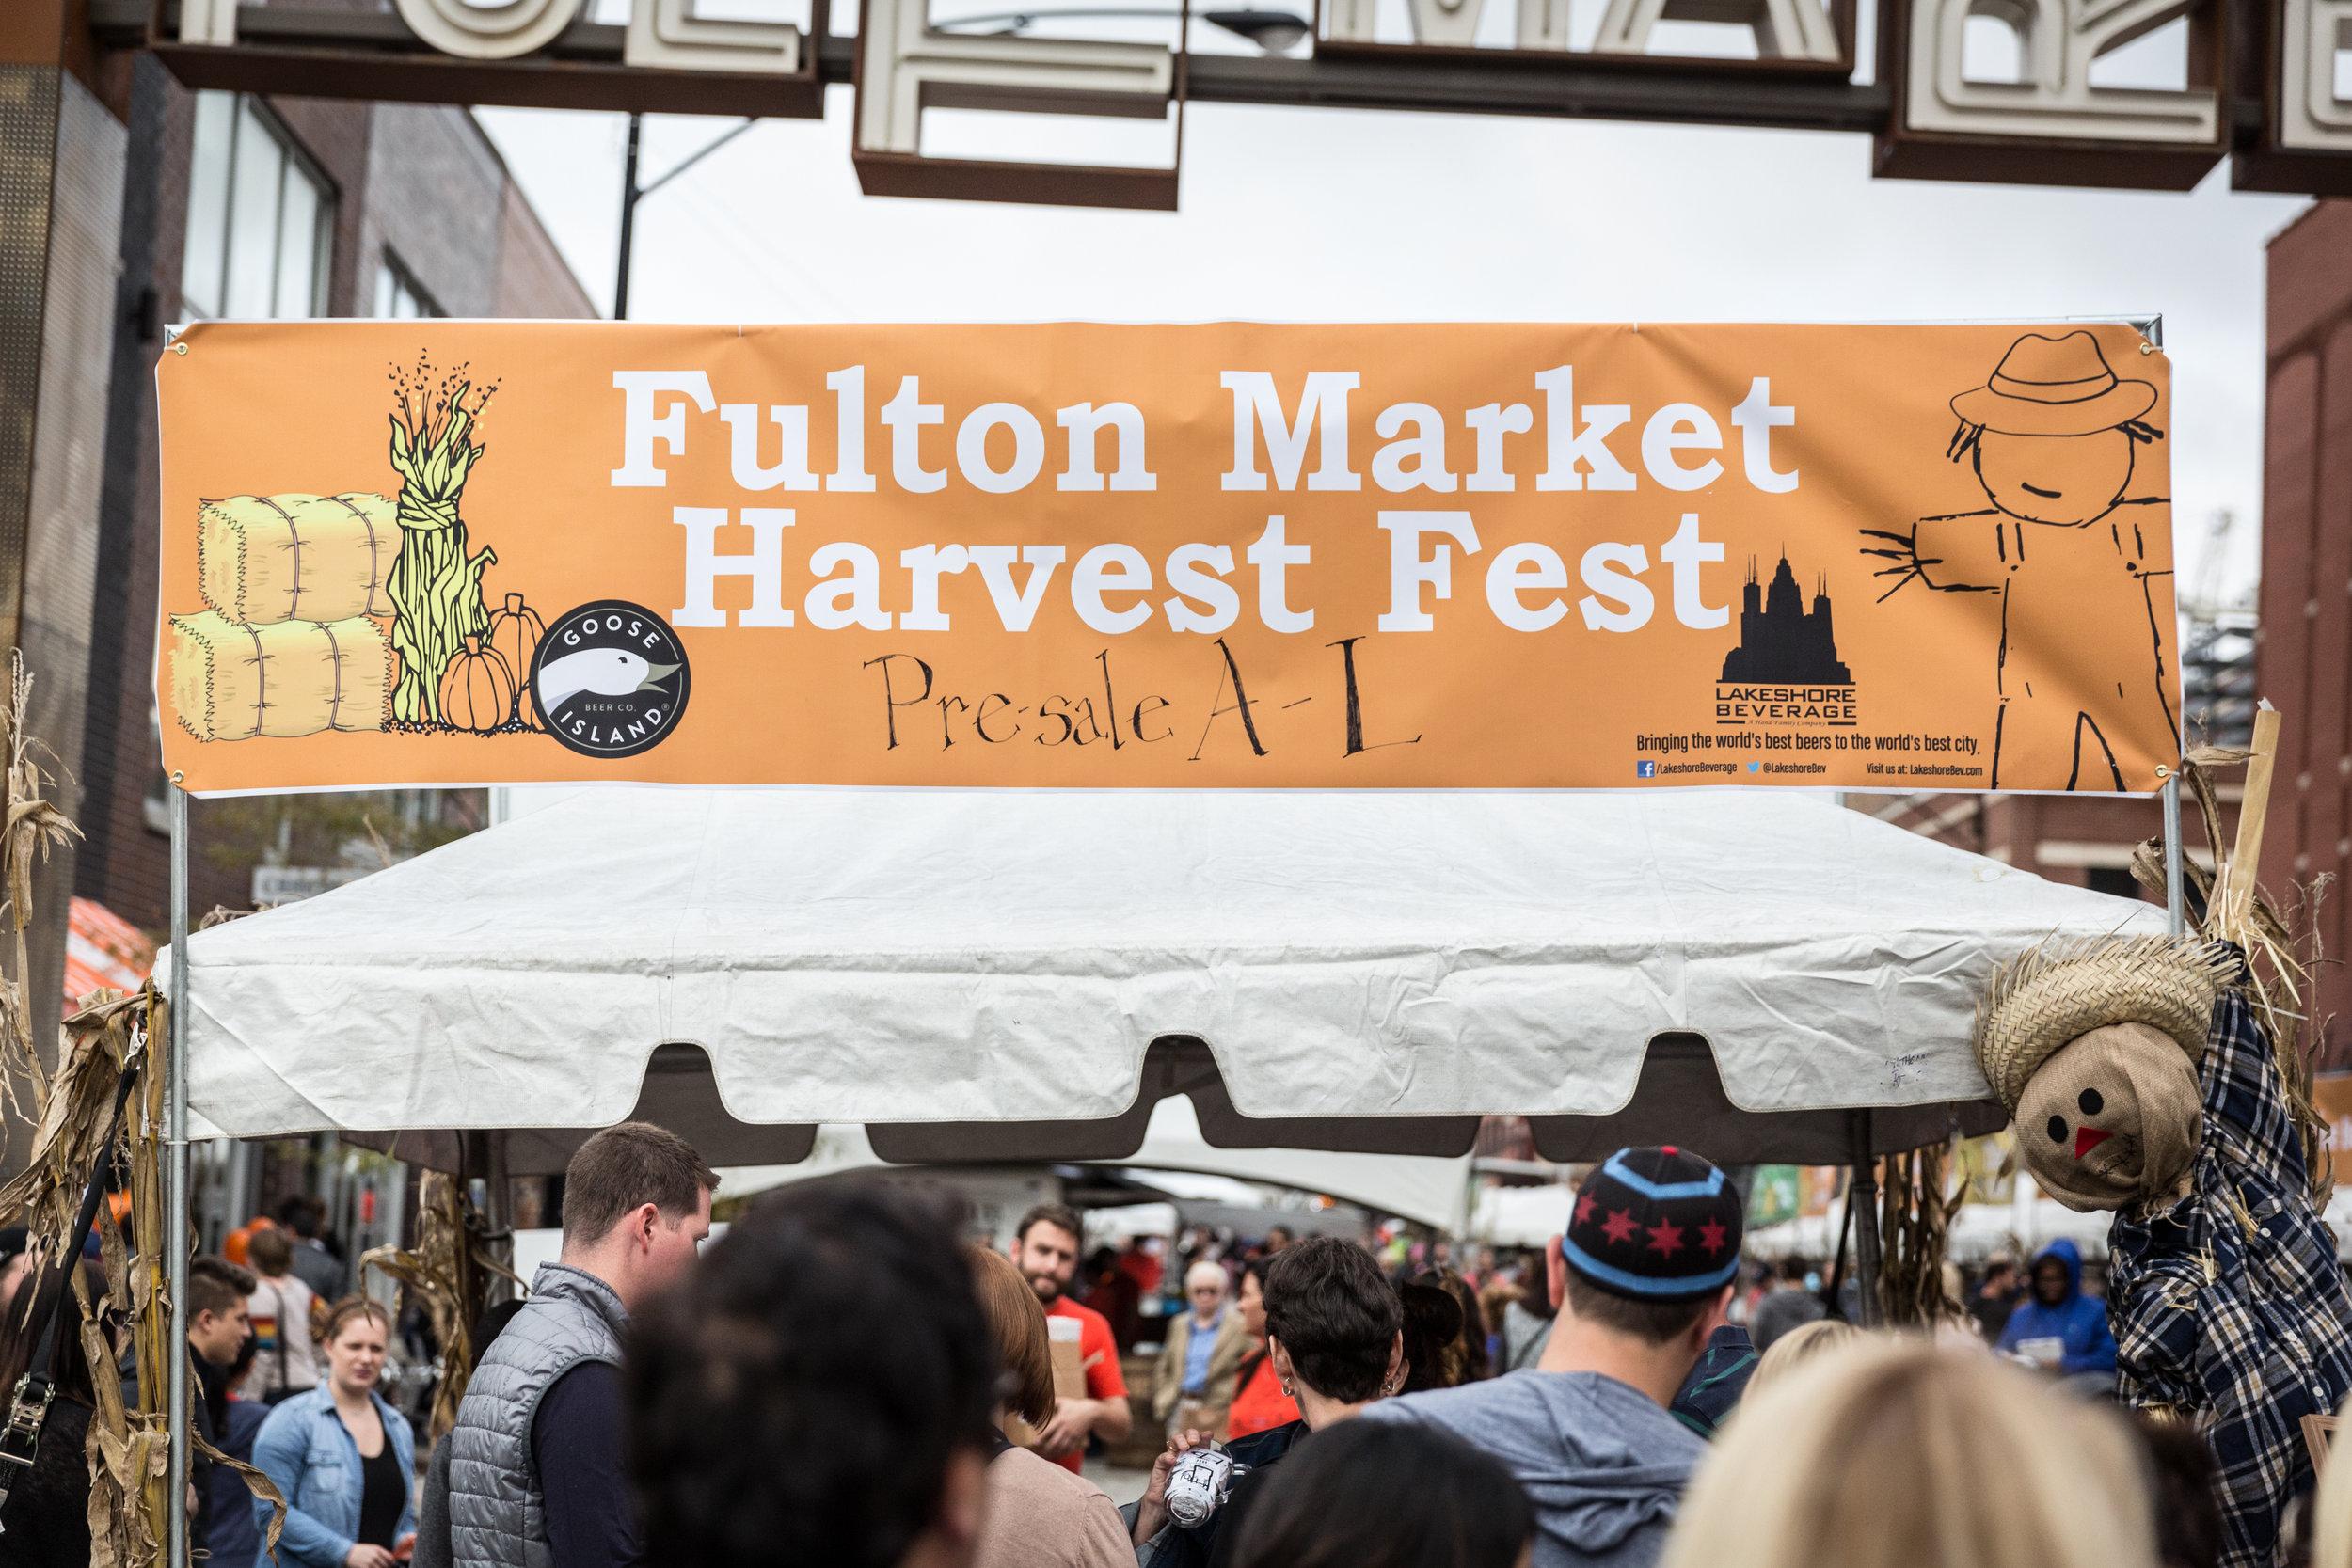 FM Harvest Fest 02OCT2016 GALDONES PHOTOGRAPHY-3.jpg